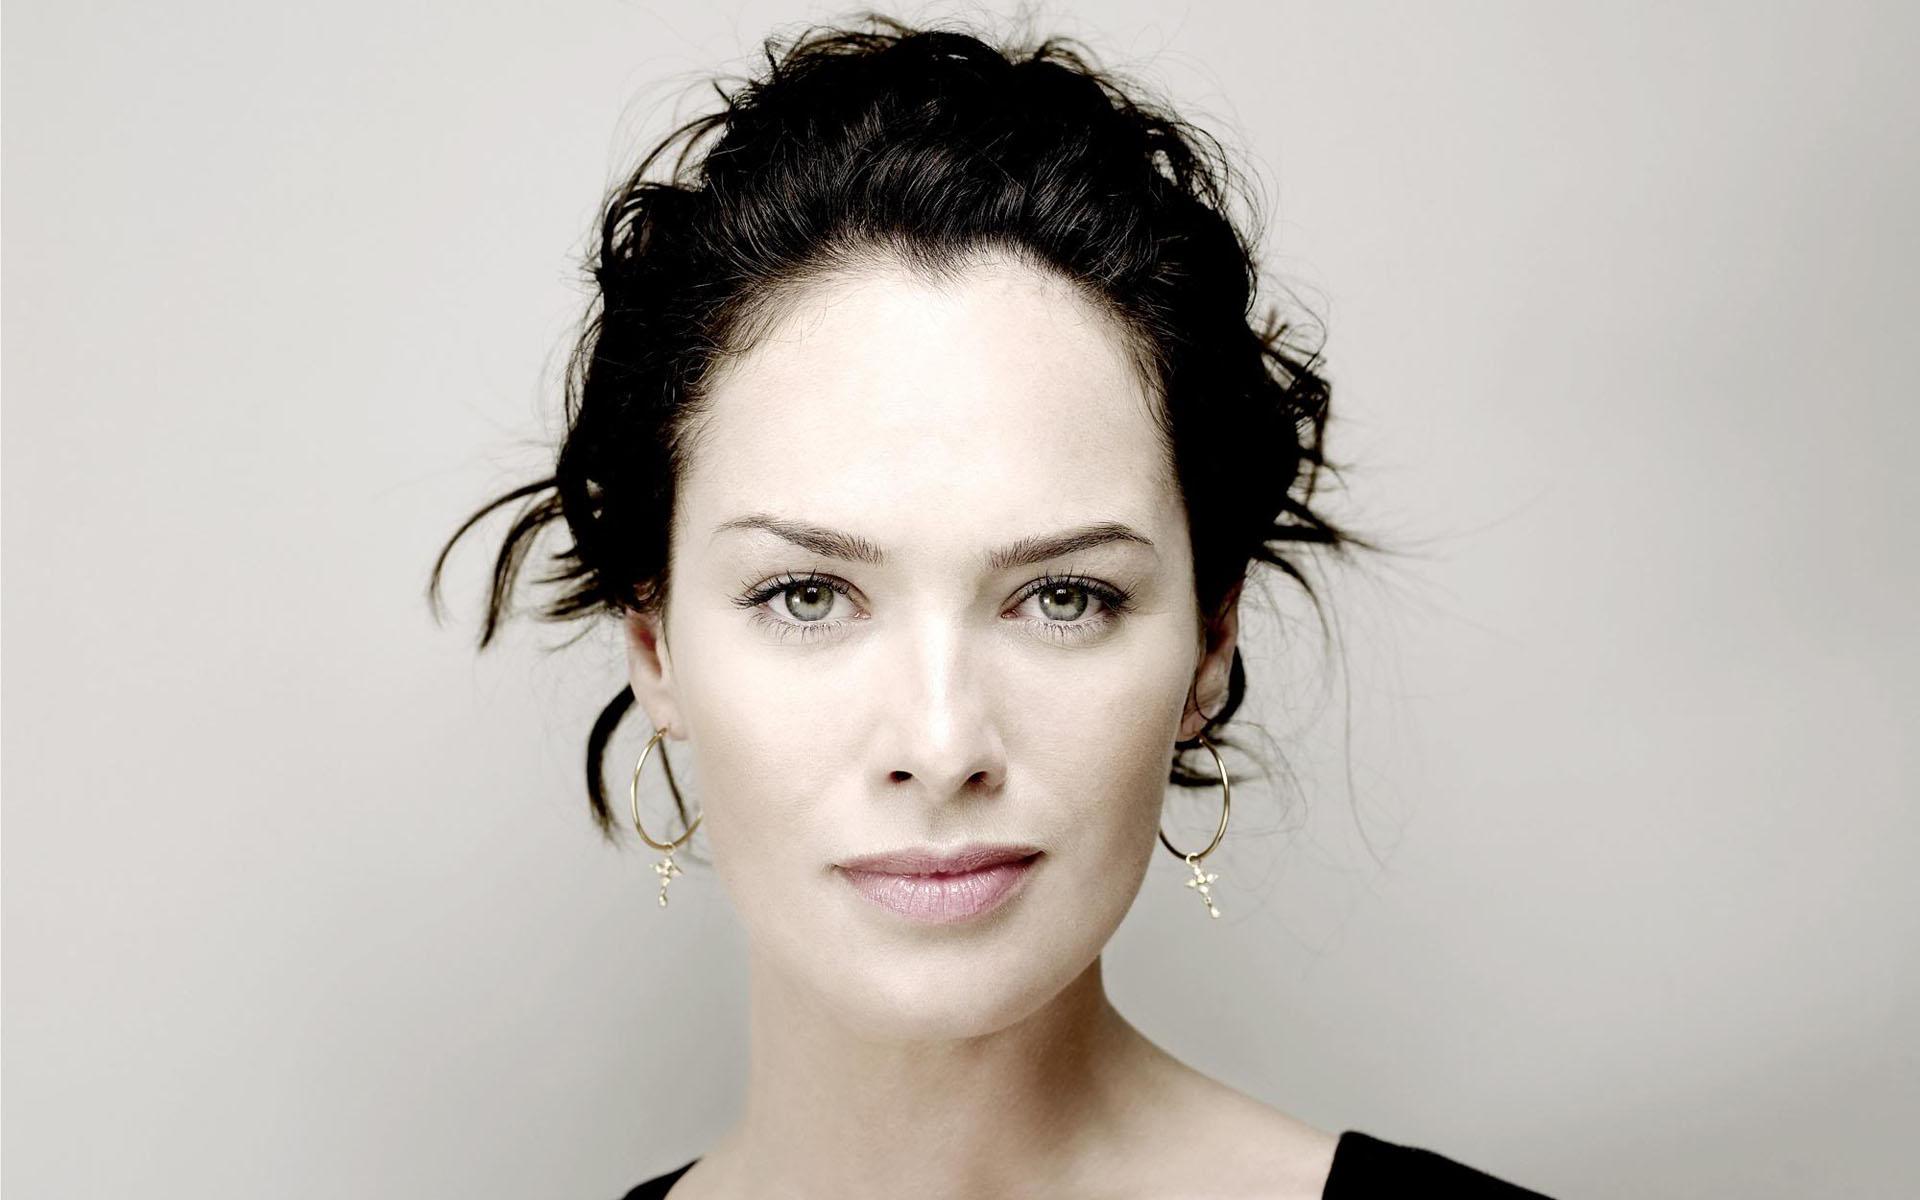 امیلیا کلارک